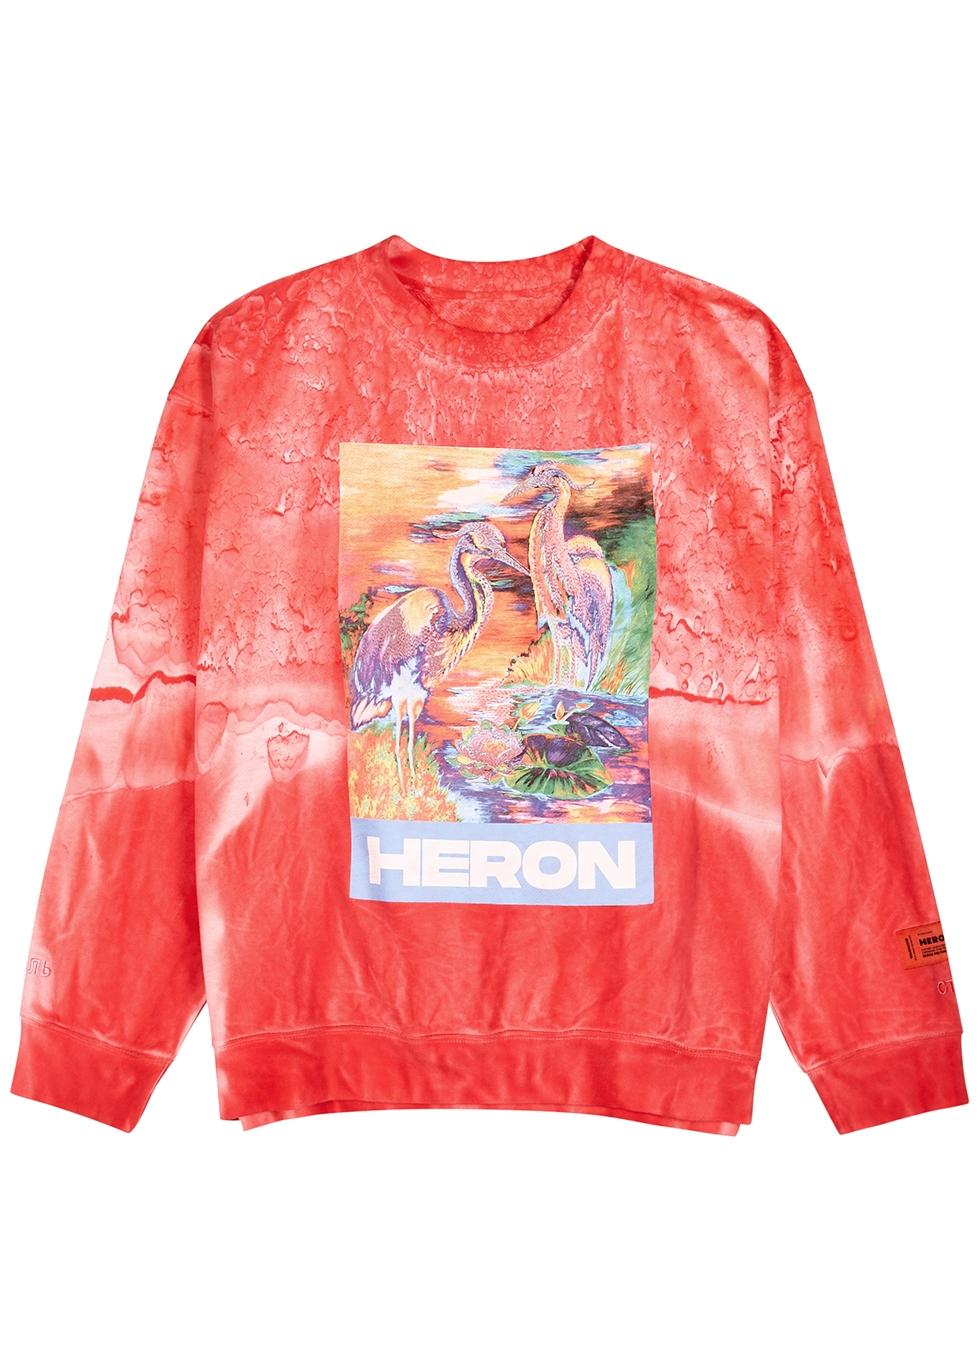 Red printed cotton sweatshirt